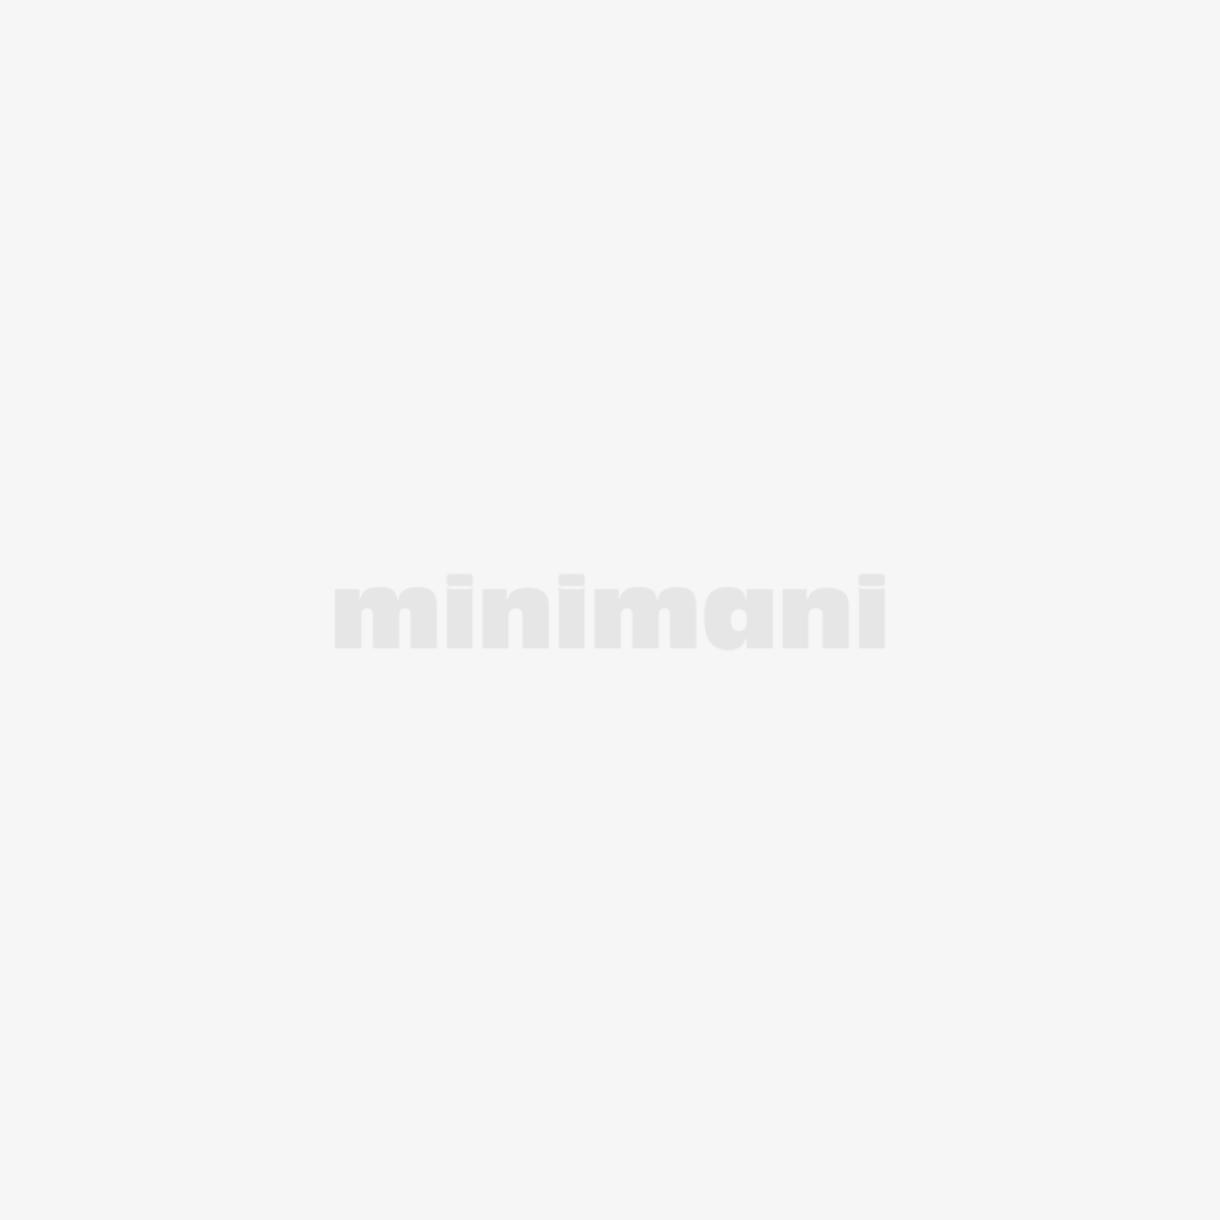 M-FILTER ILMANSUODATIN  MAP 6898 SUBARU LEGACY 1.8